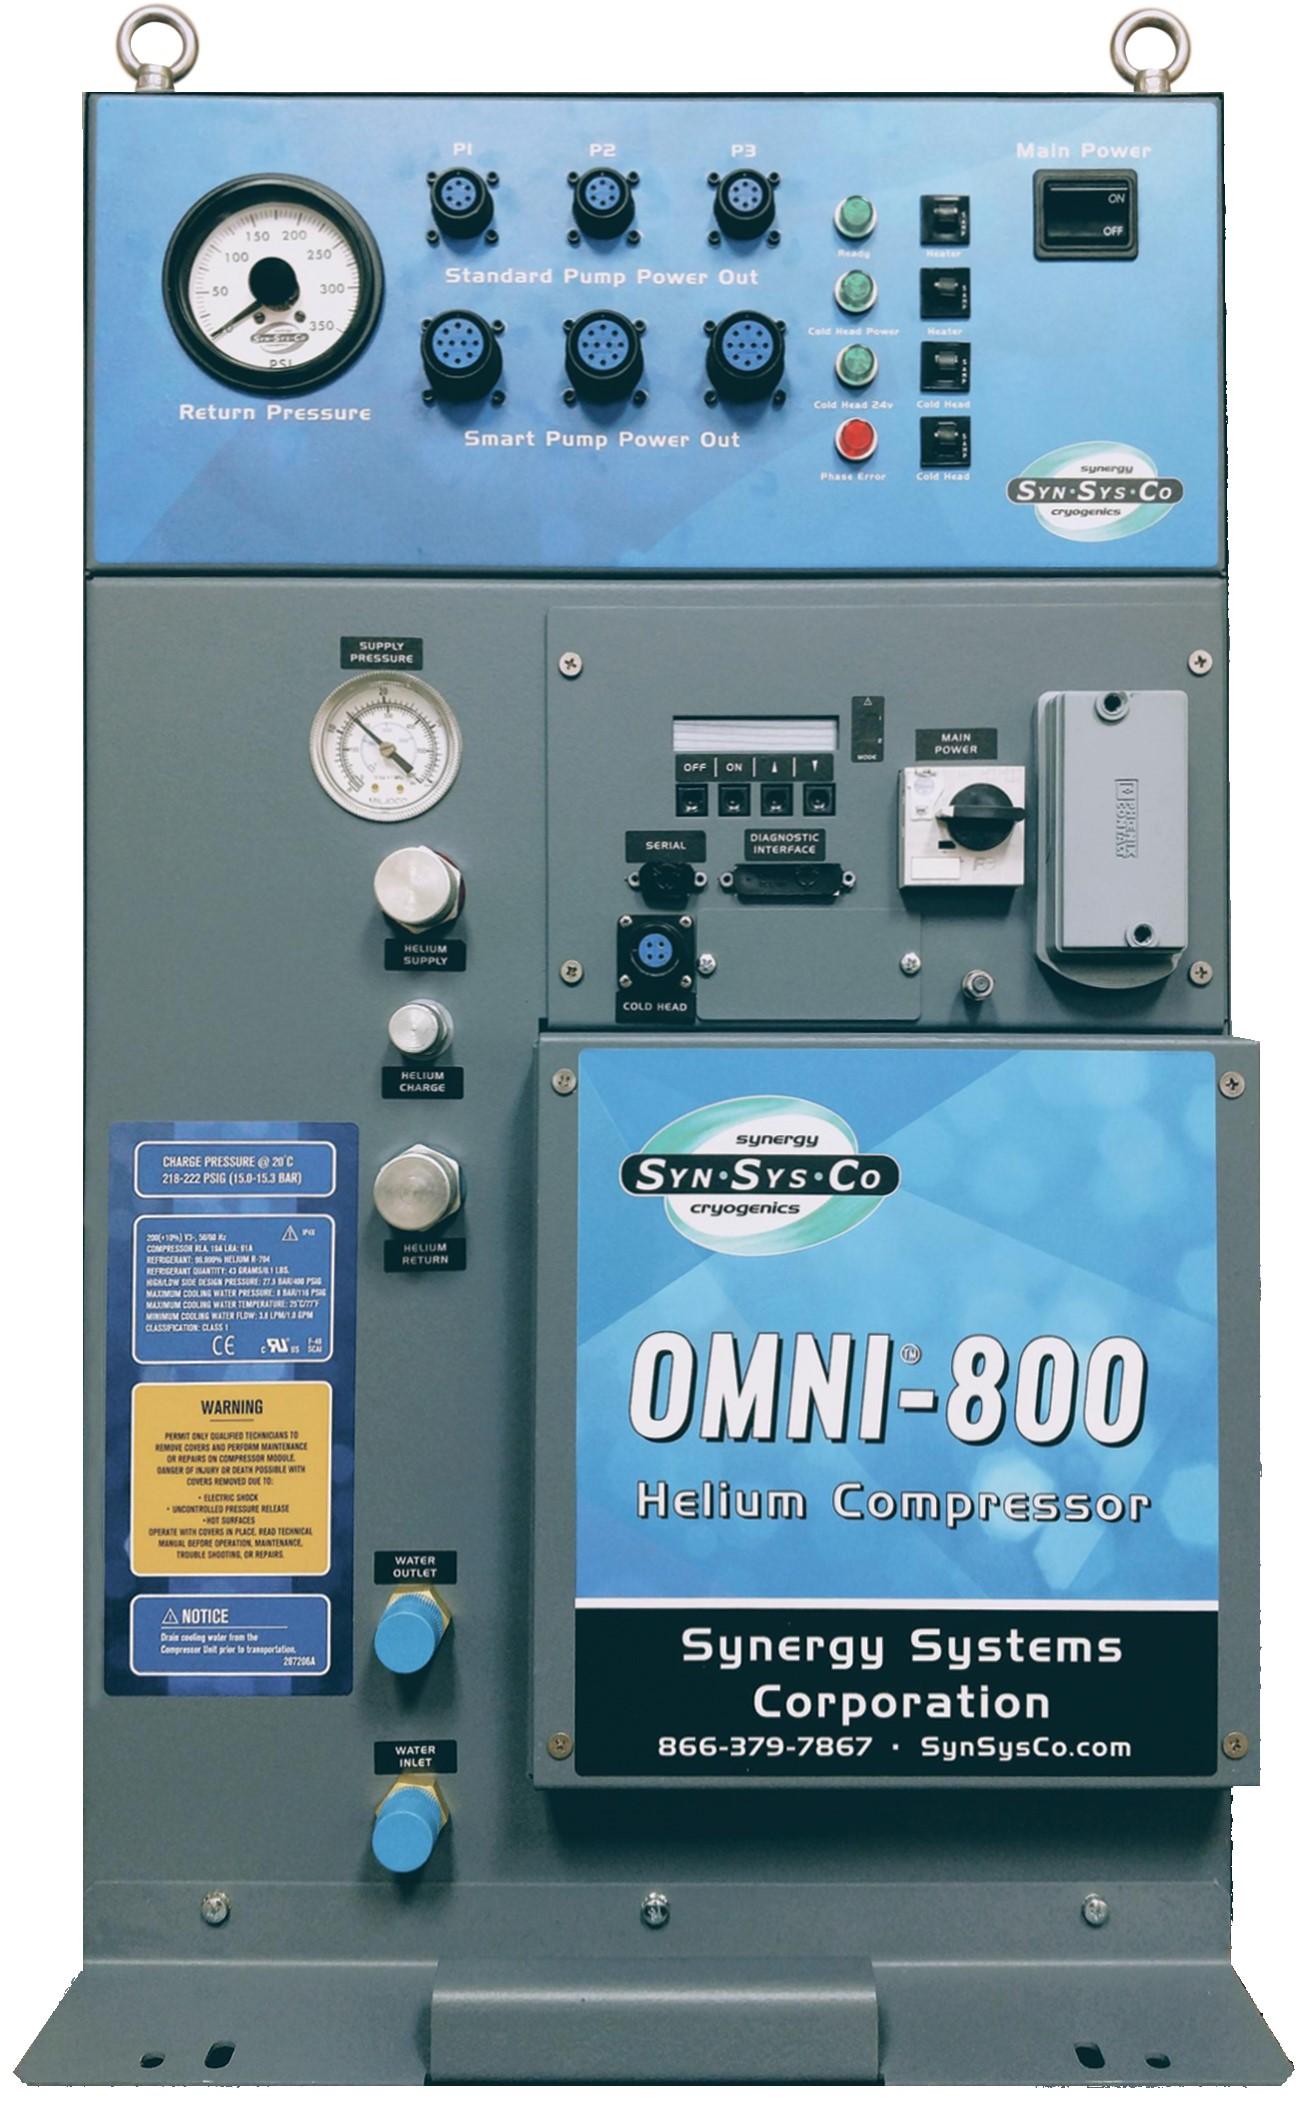 OMNI® 800 Helium Compressor